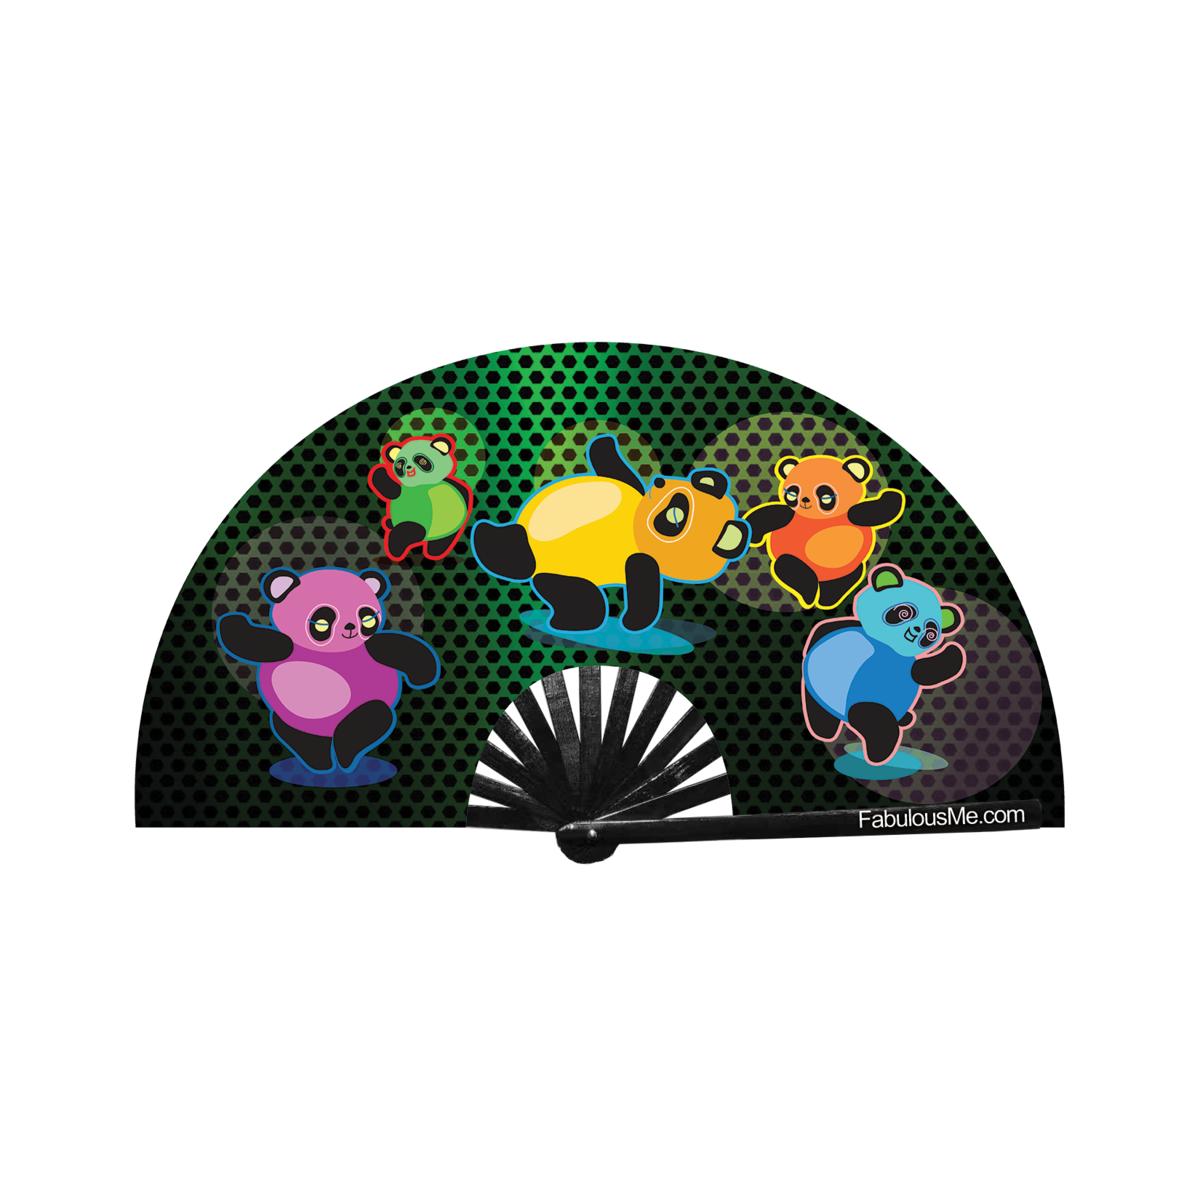 JJMalibu Plur Panda Dancing Fan (UV Glow)